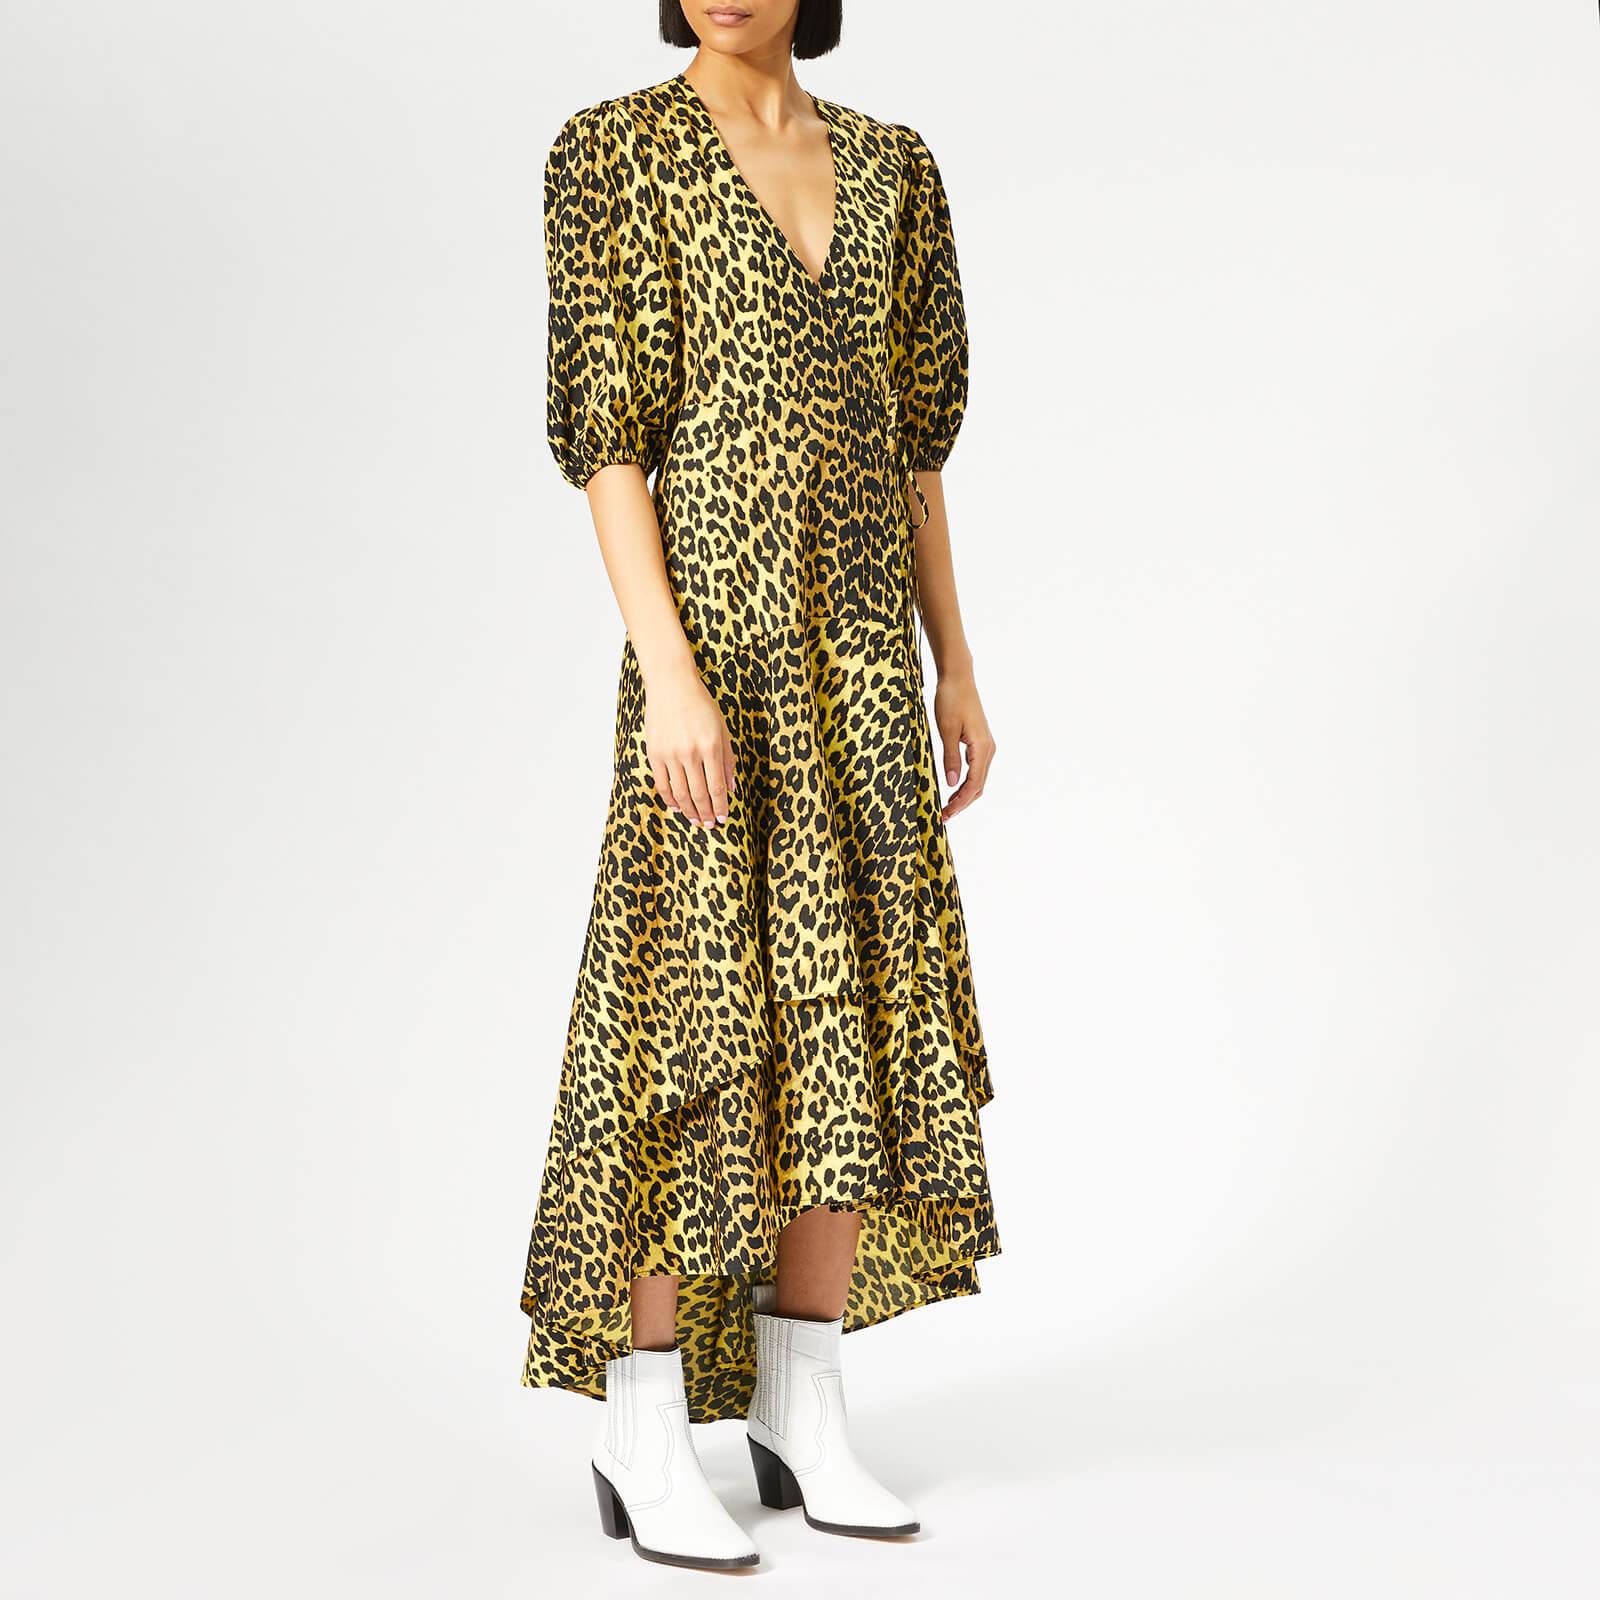 5a452ec4 Ganni Women's Bijou Wrap Dress - Leopard - Free UK Delivery over £50